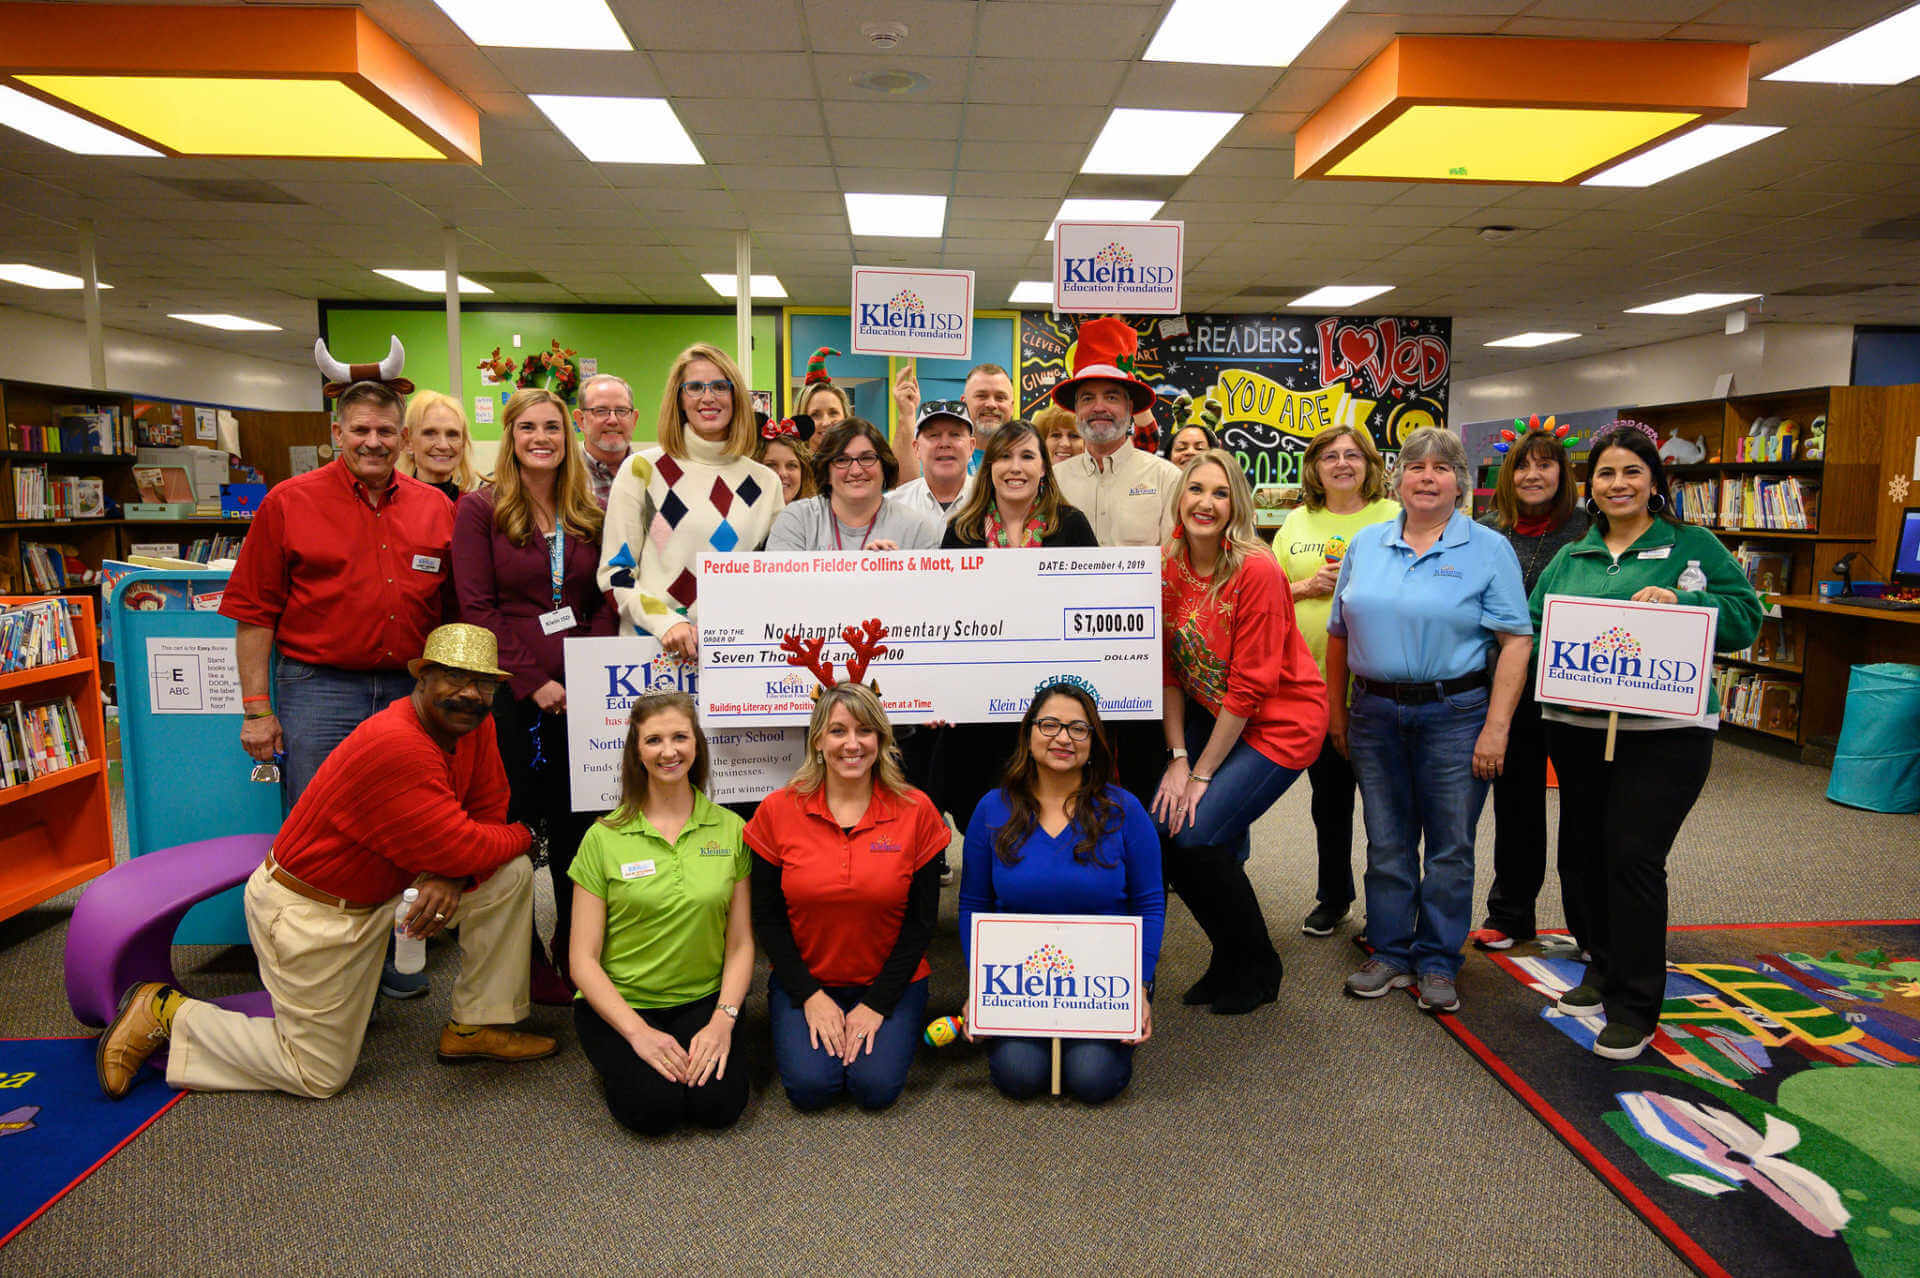 Northampton Elementary Receives $7,000 Grant for Book Vending Machine